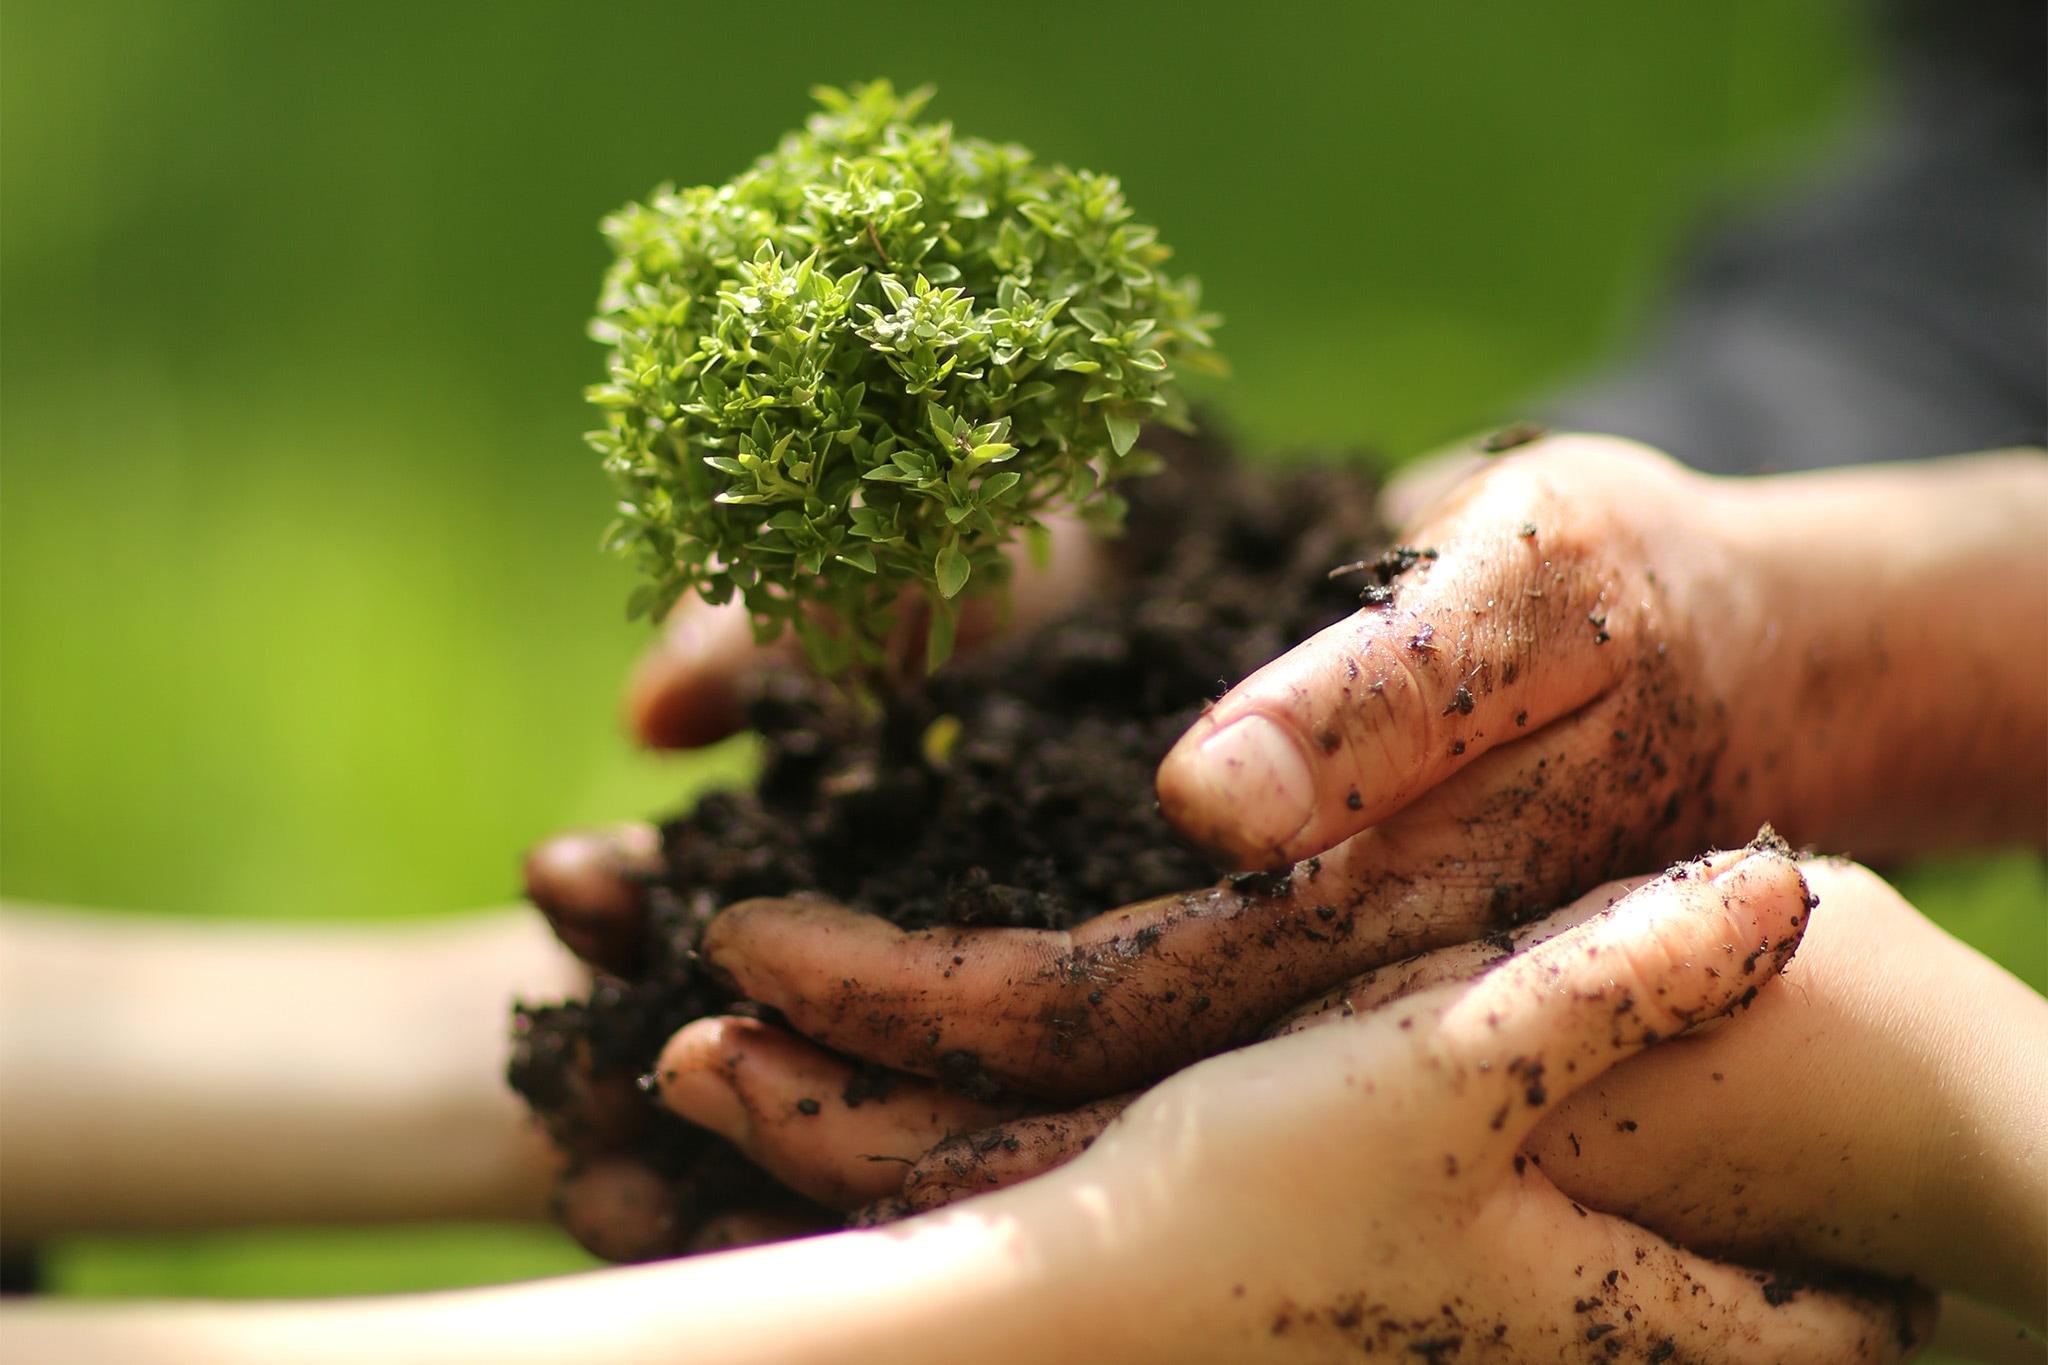 jugendkulturjahr-2020-ratingen-jkj2020-pro-zukunft-nachhaltigkeit-upcycling